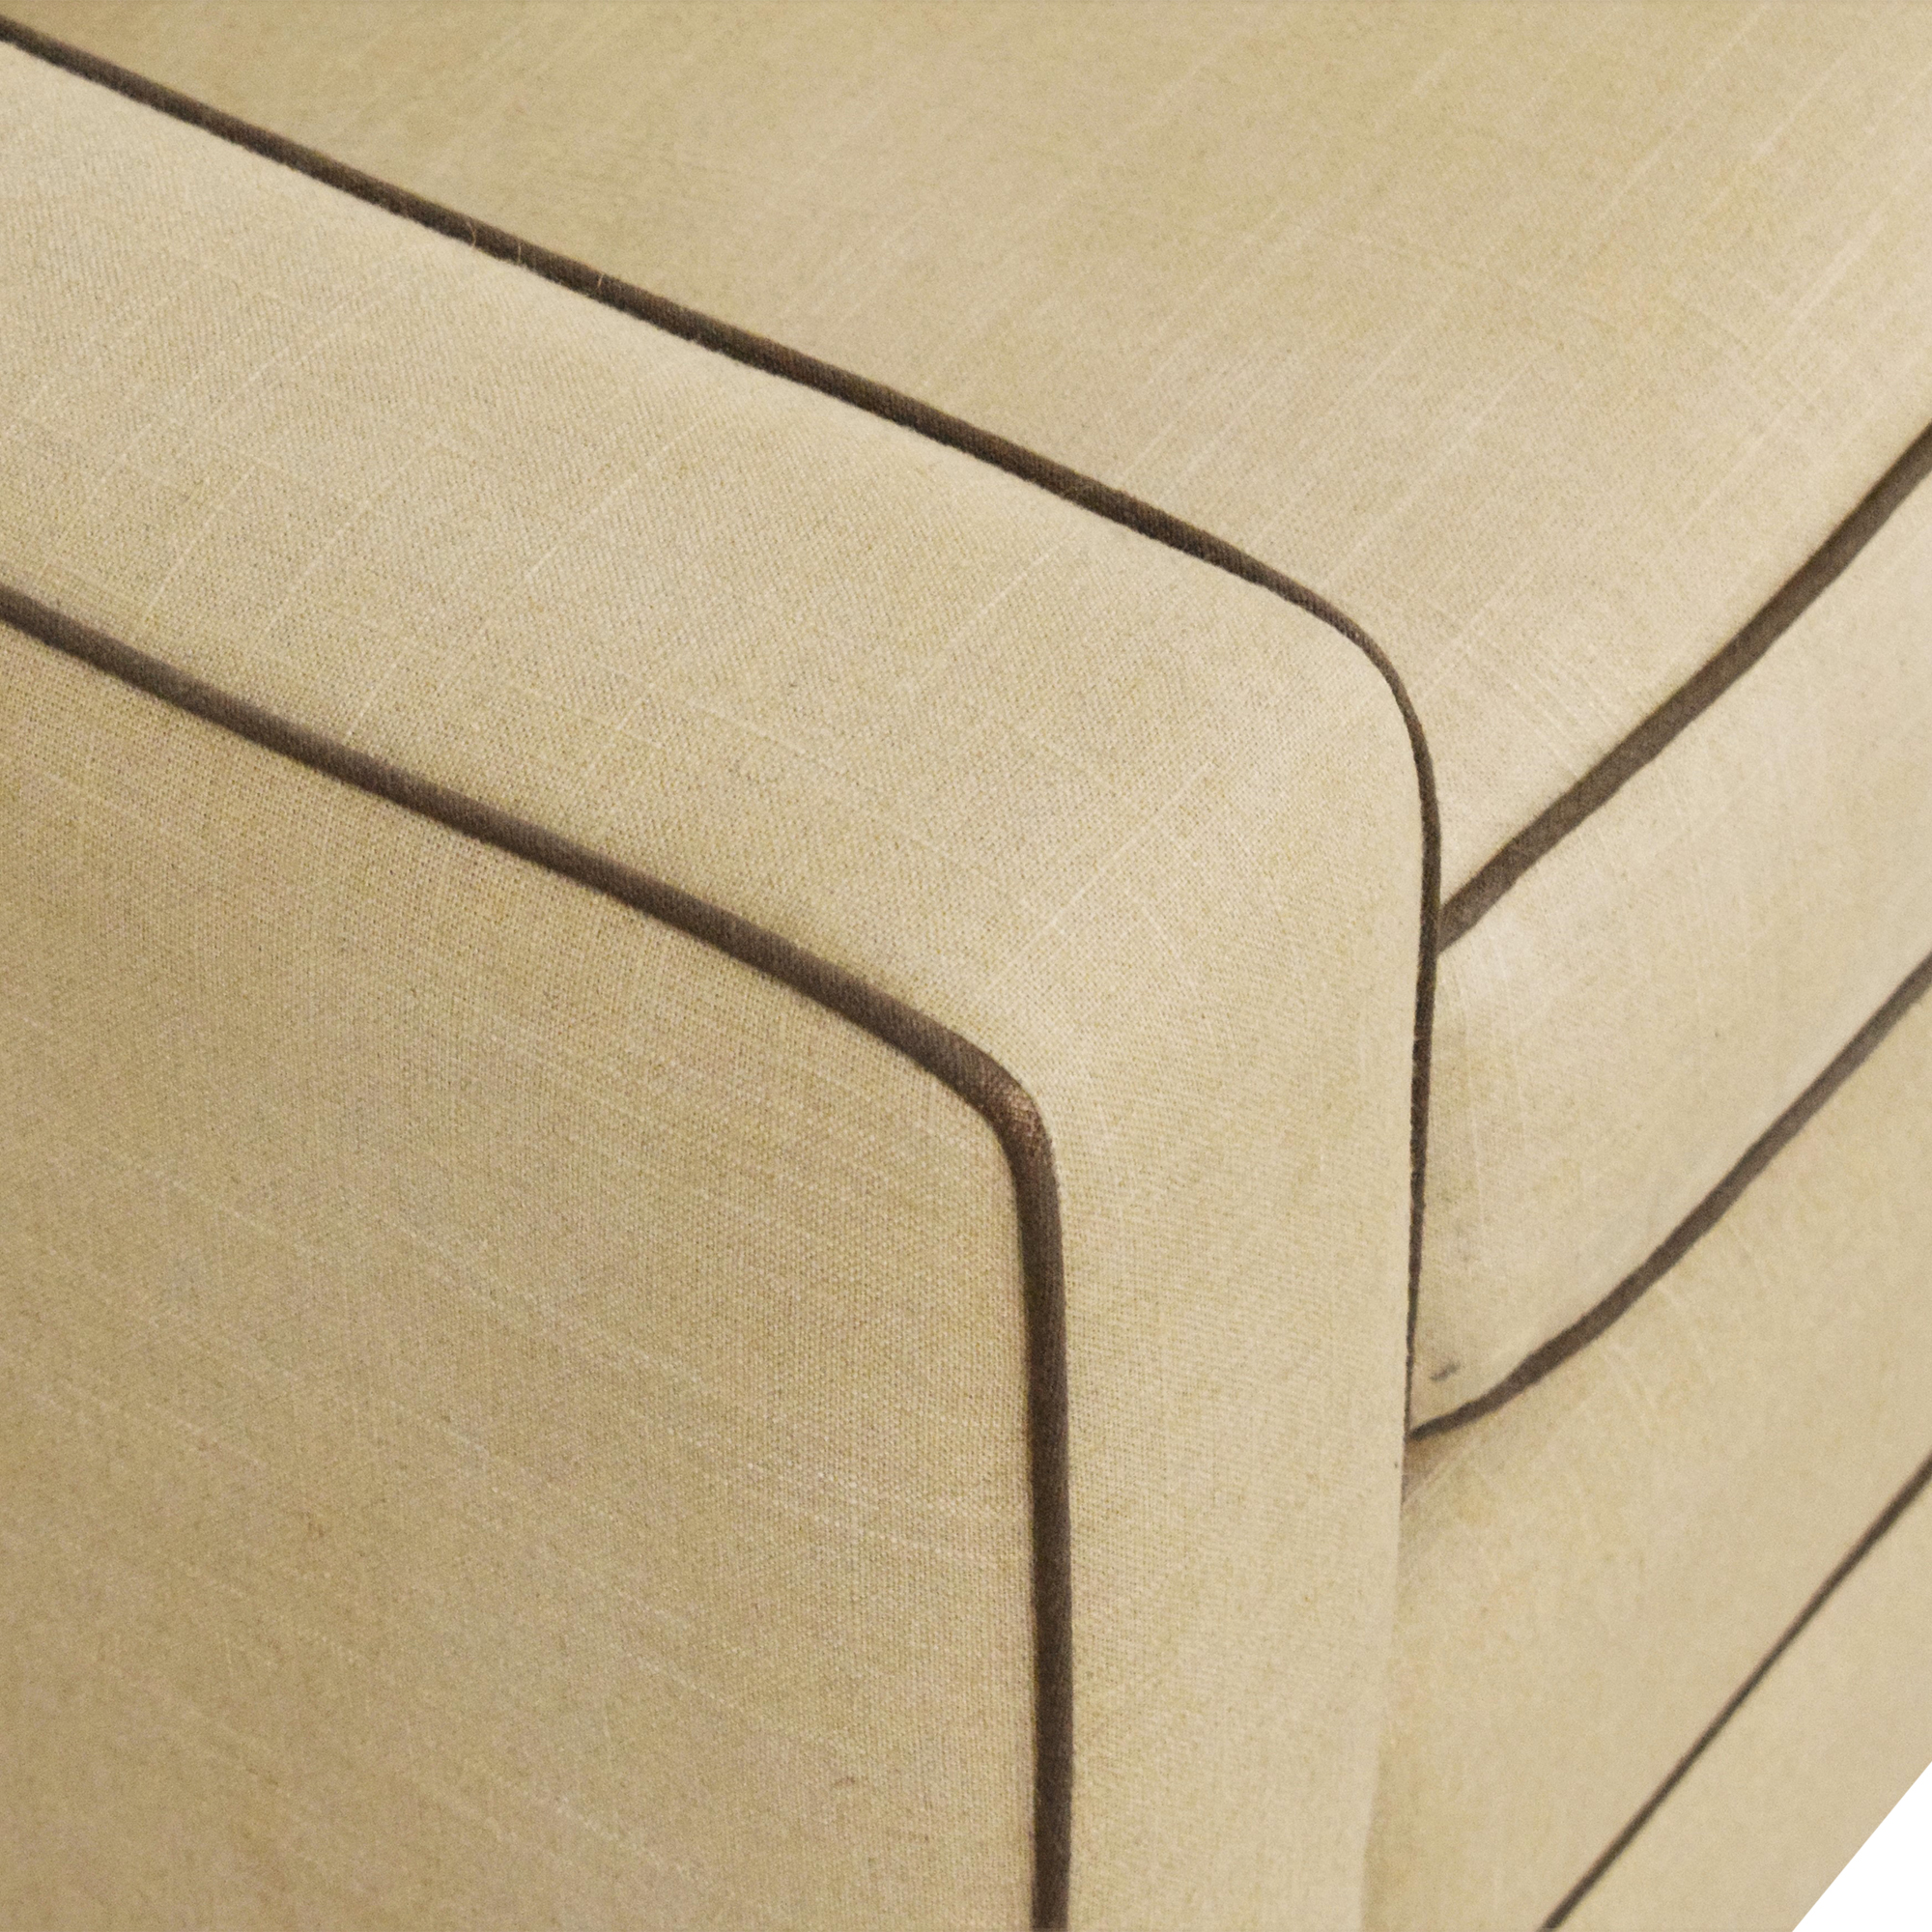 Carlyle Carlyle Custom Sleeper Sofa nyc